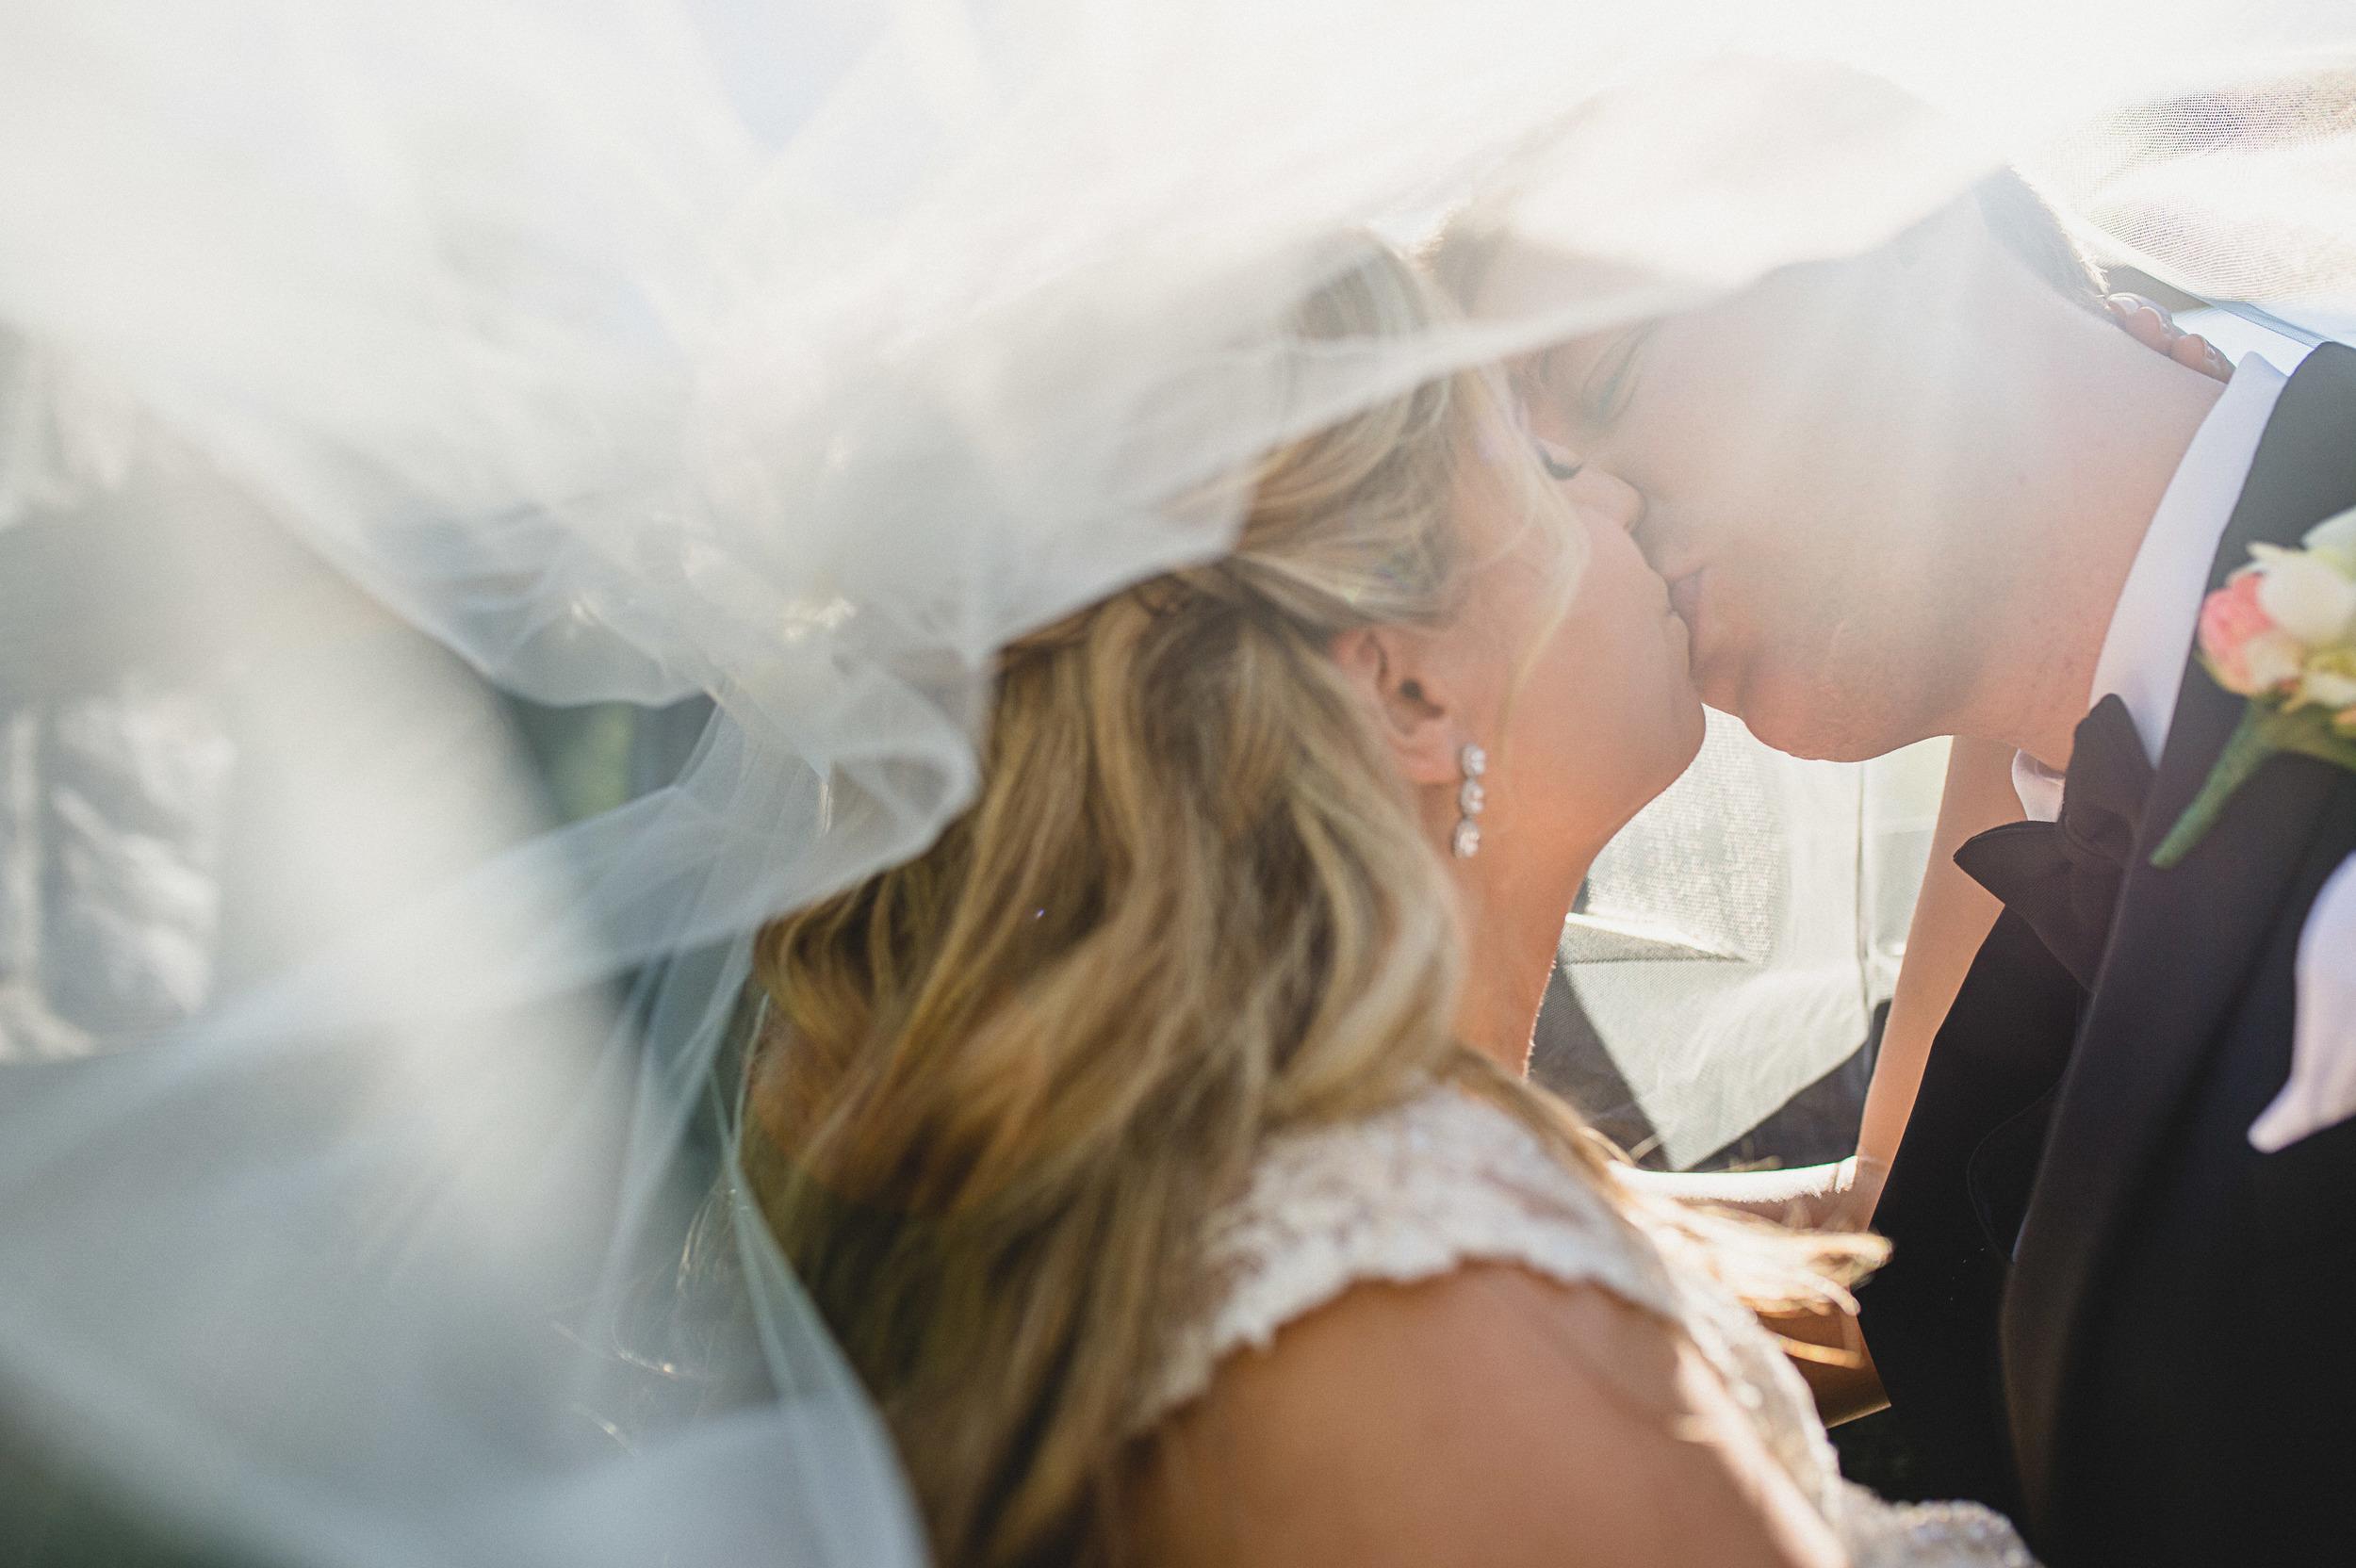 Vancouver St Augustine 's Church wedding photographer edward lai photography-66.jpg